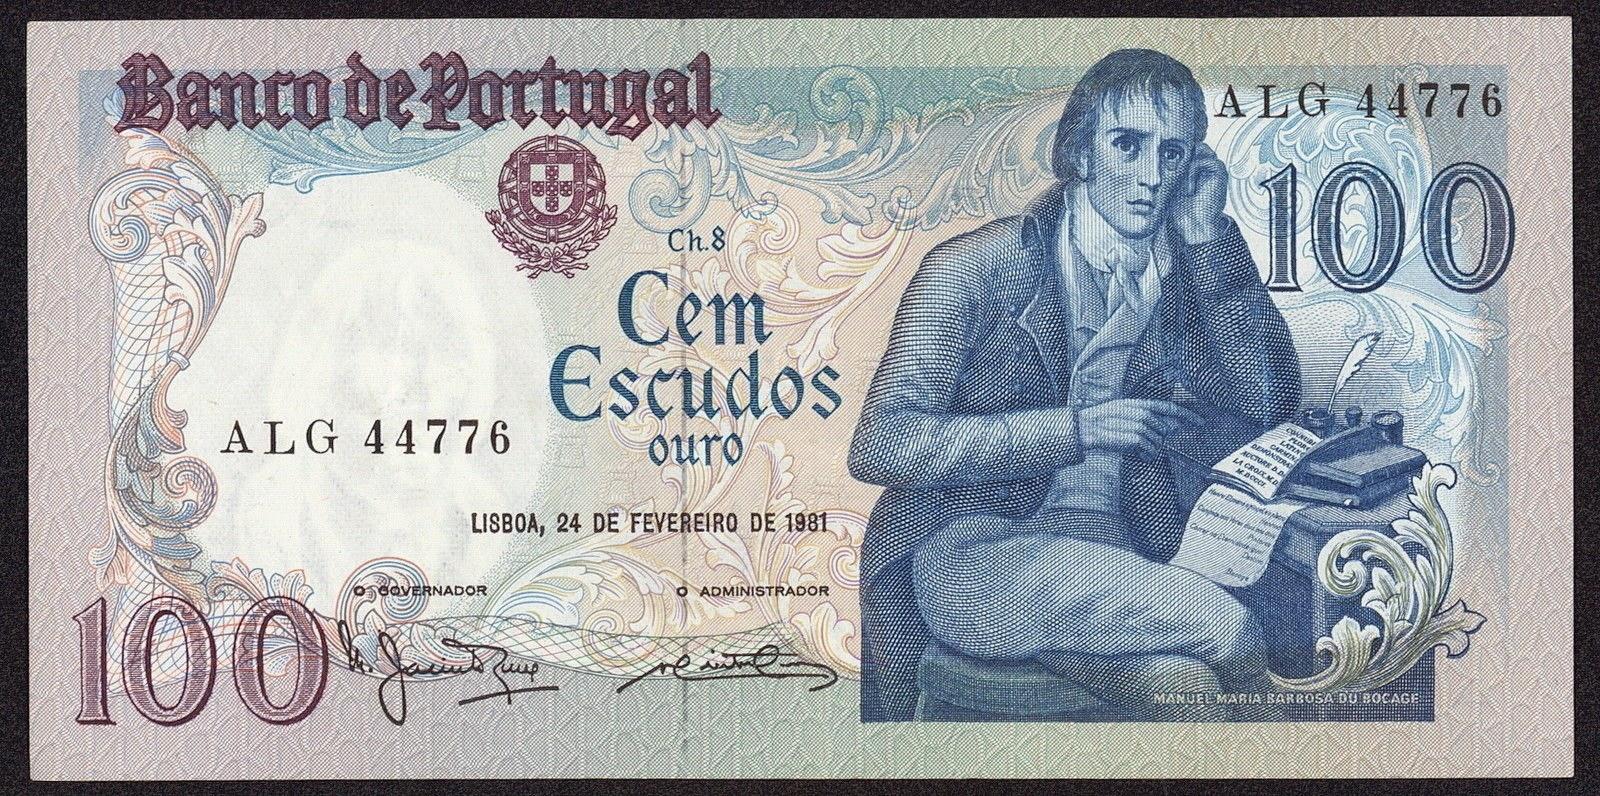 Portugal Banknotes 100 Escudos banknote 1981 Portuguese poet Manuel Maria Barbosa du Bocage